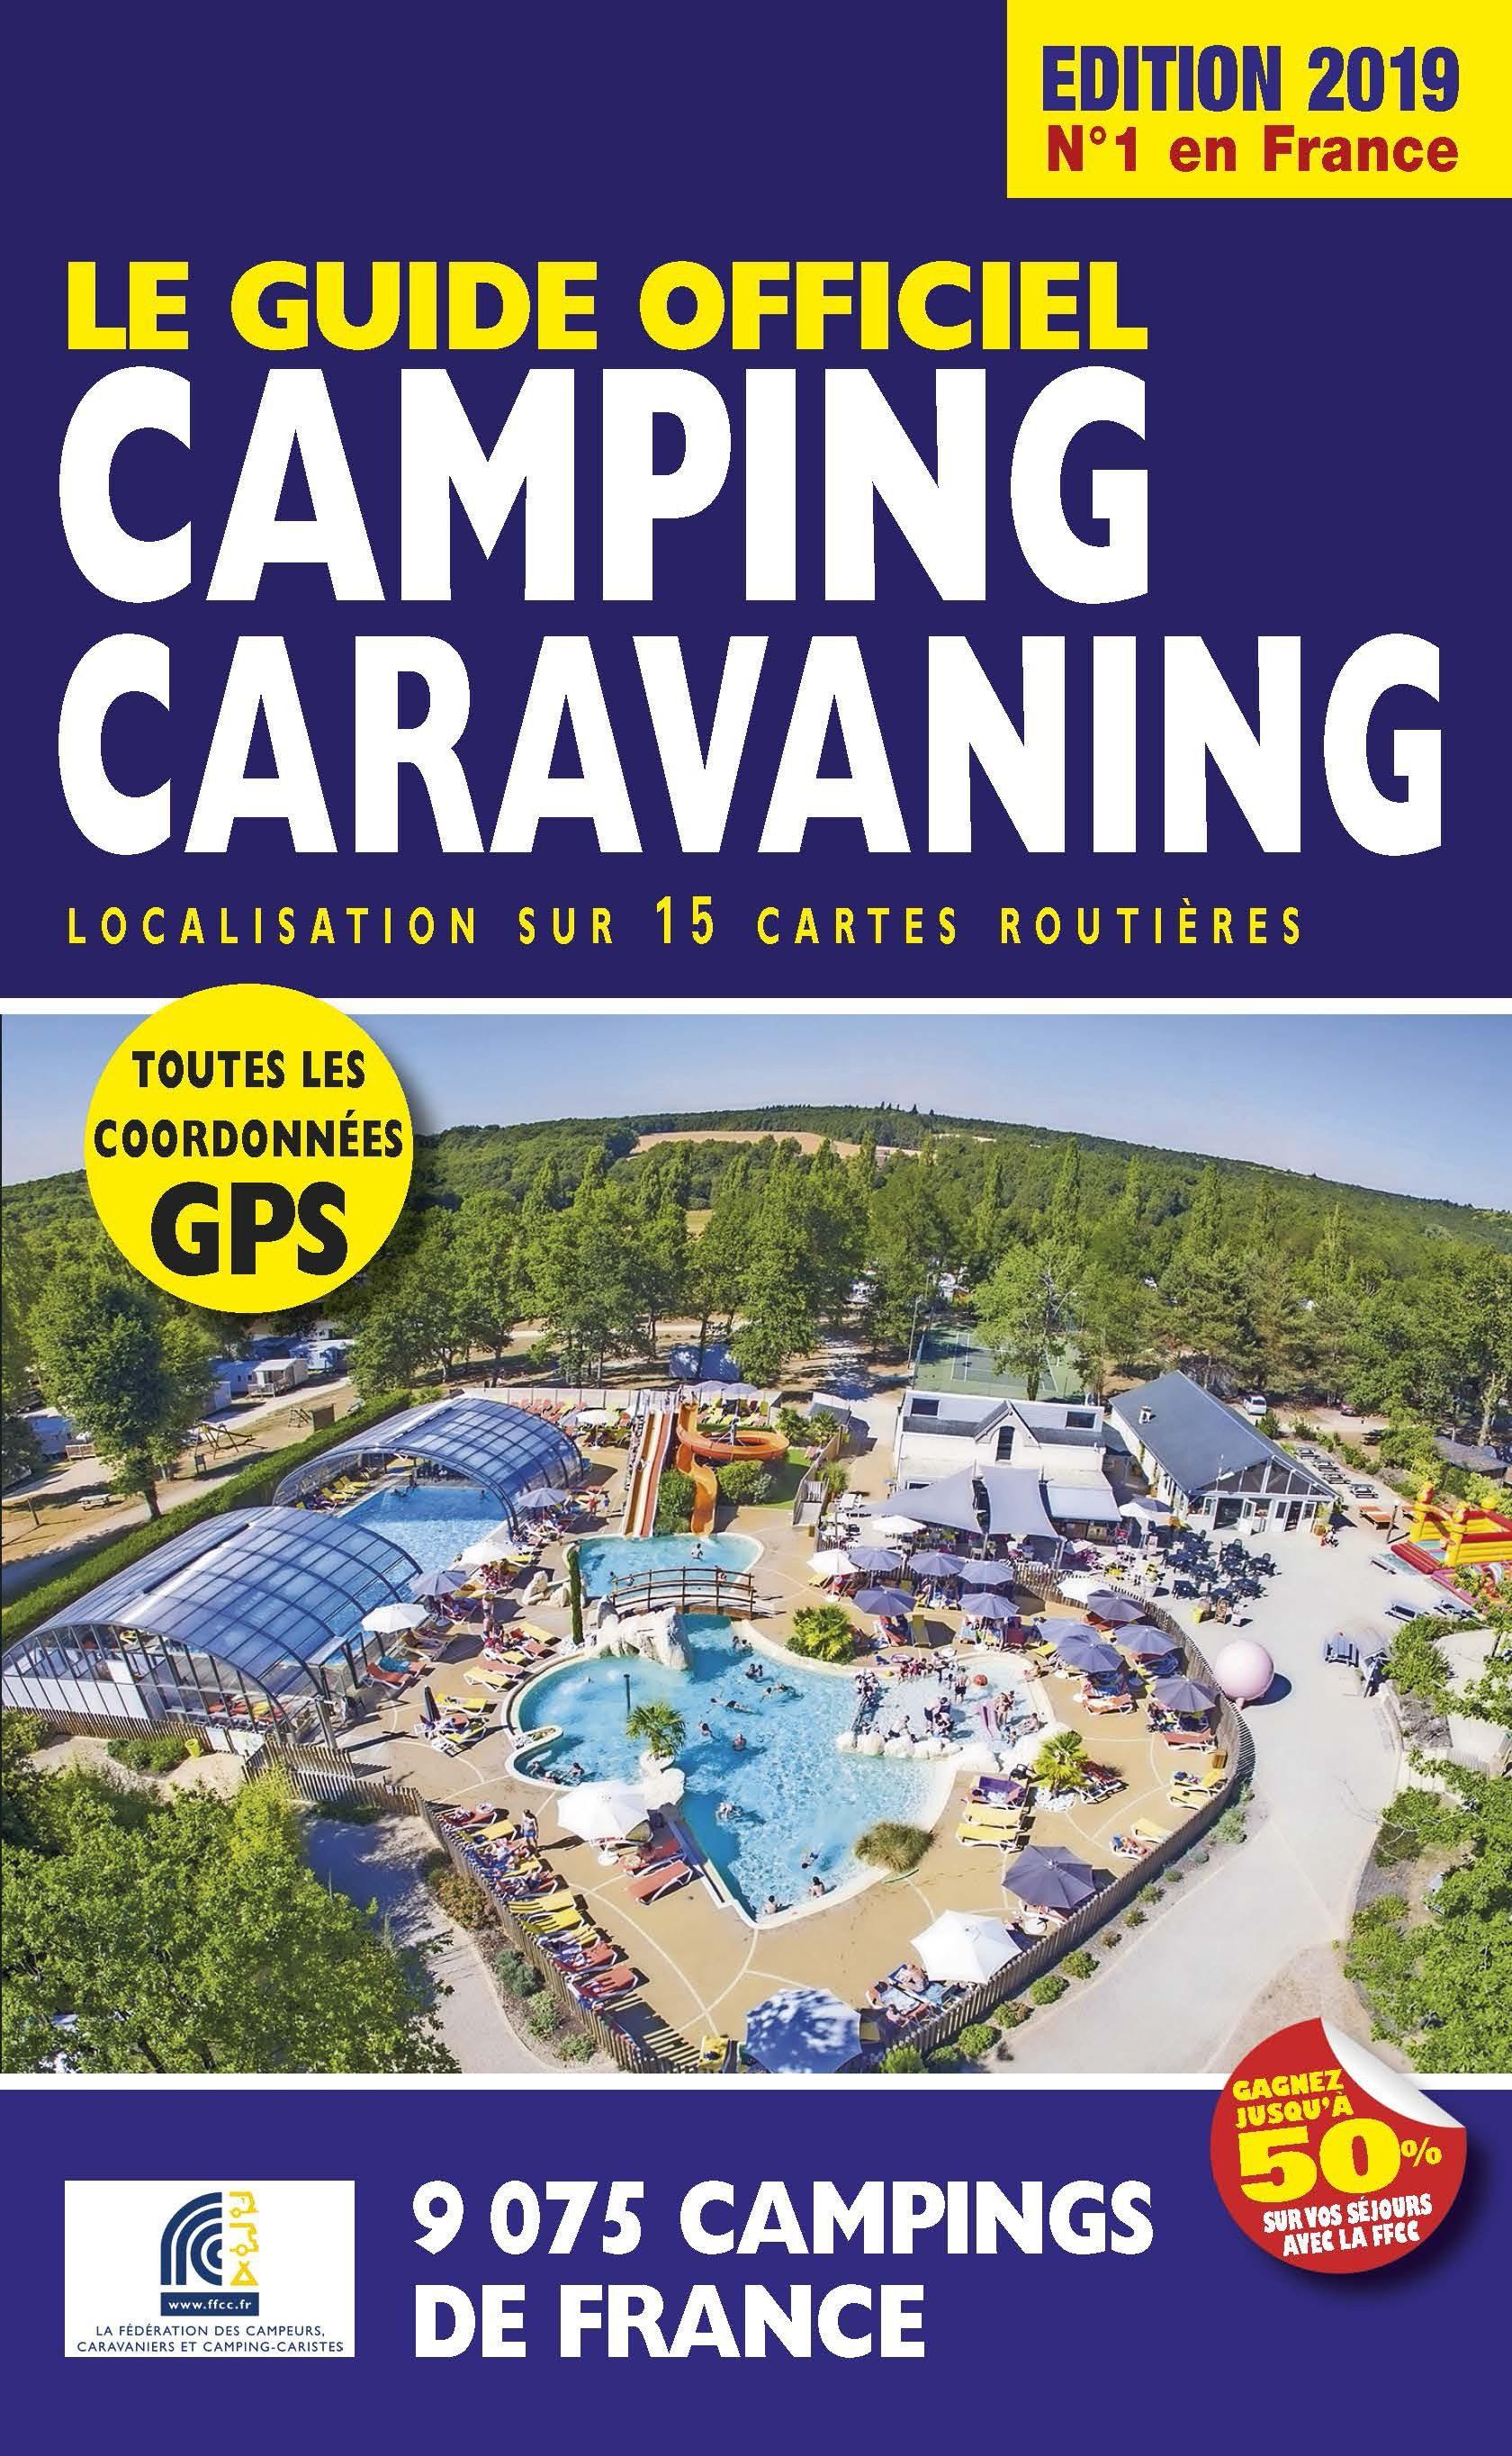 www.campingfrance.com